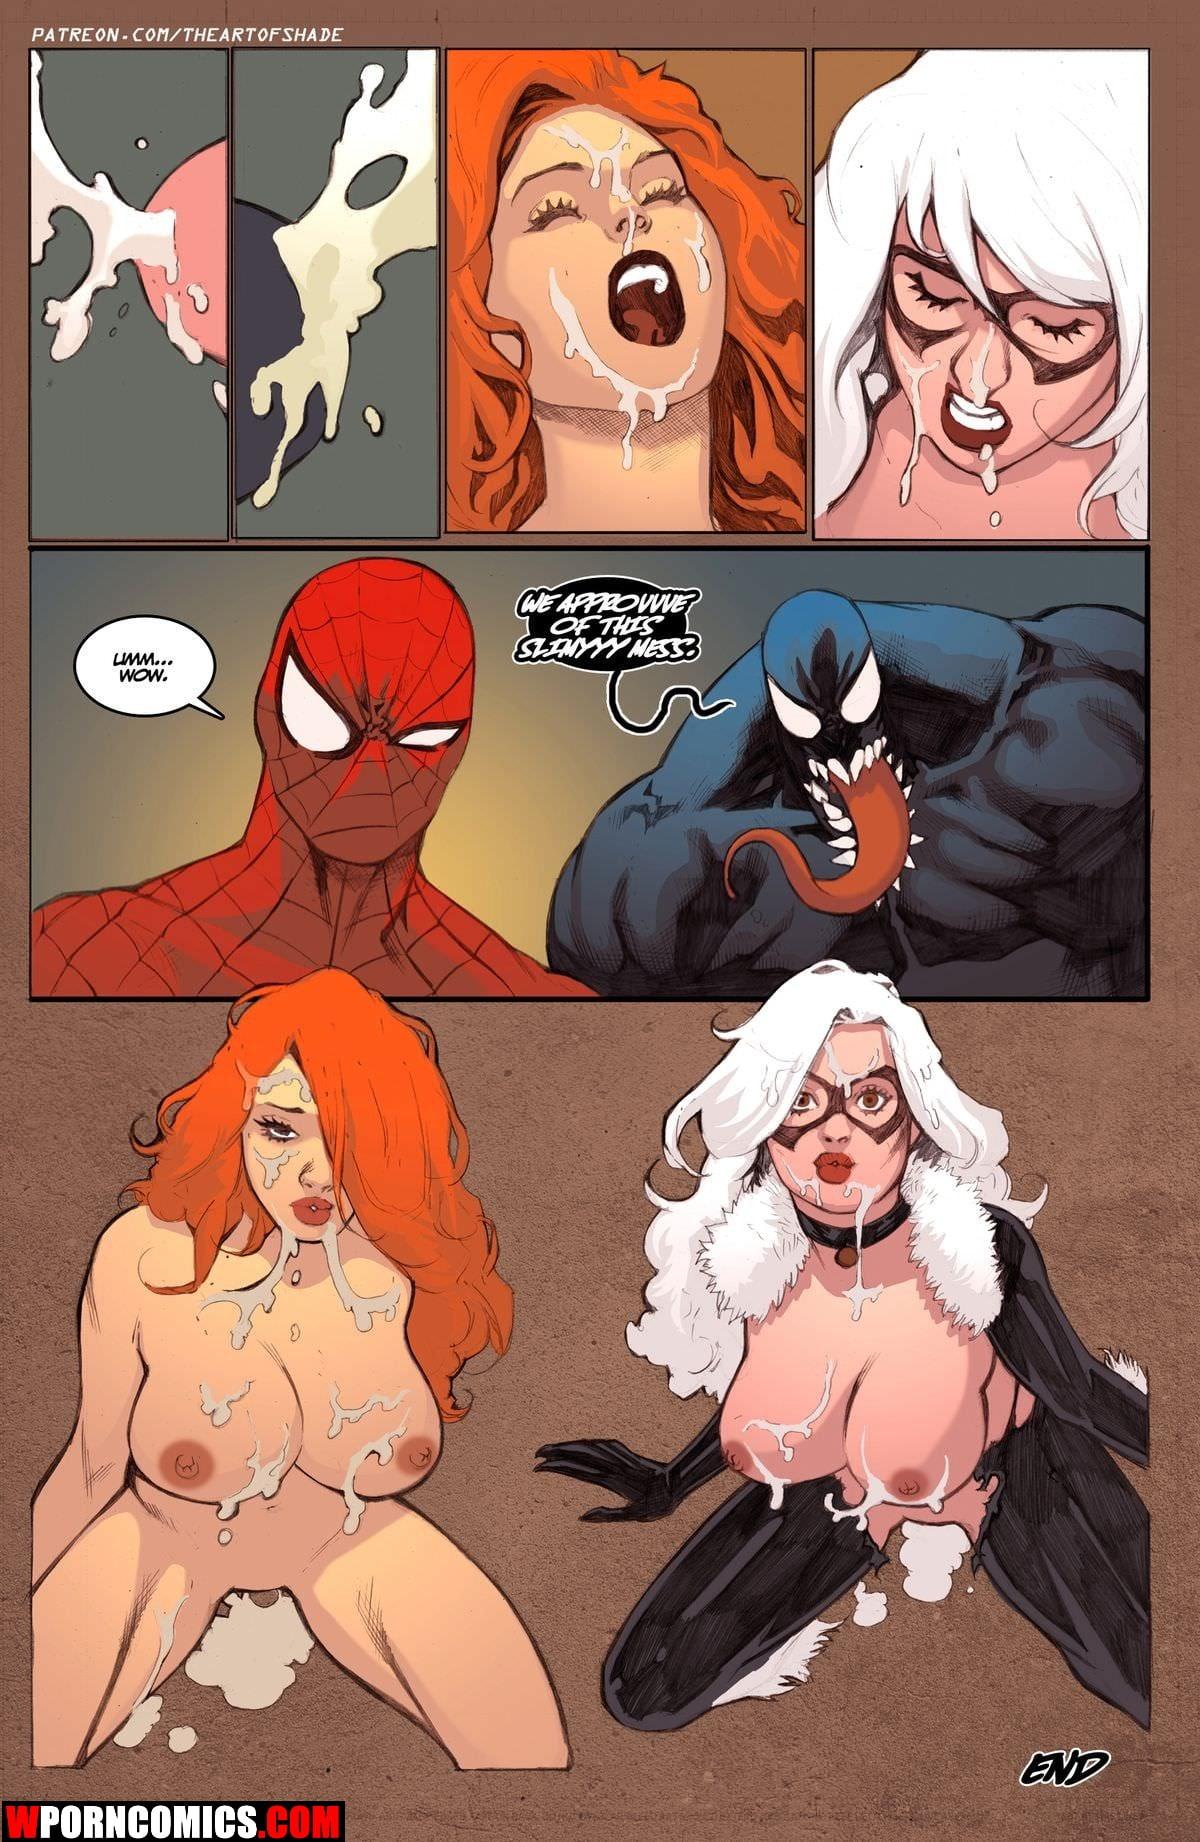 porn-comics-spiderbang-2019-11-04/porn-comics-spiderbang-2019-11-04-8054.jpg